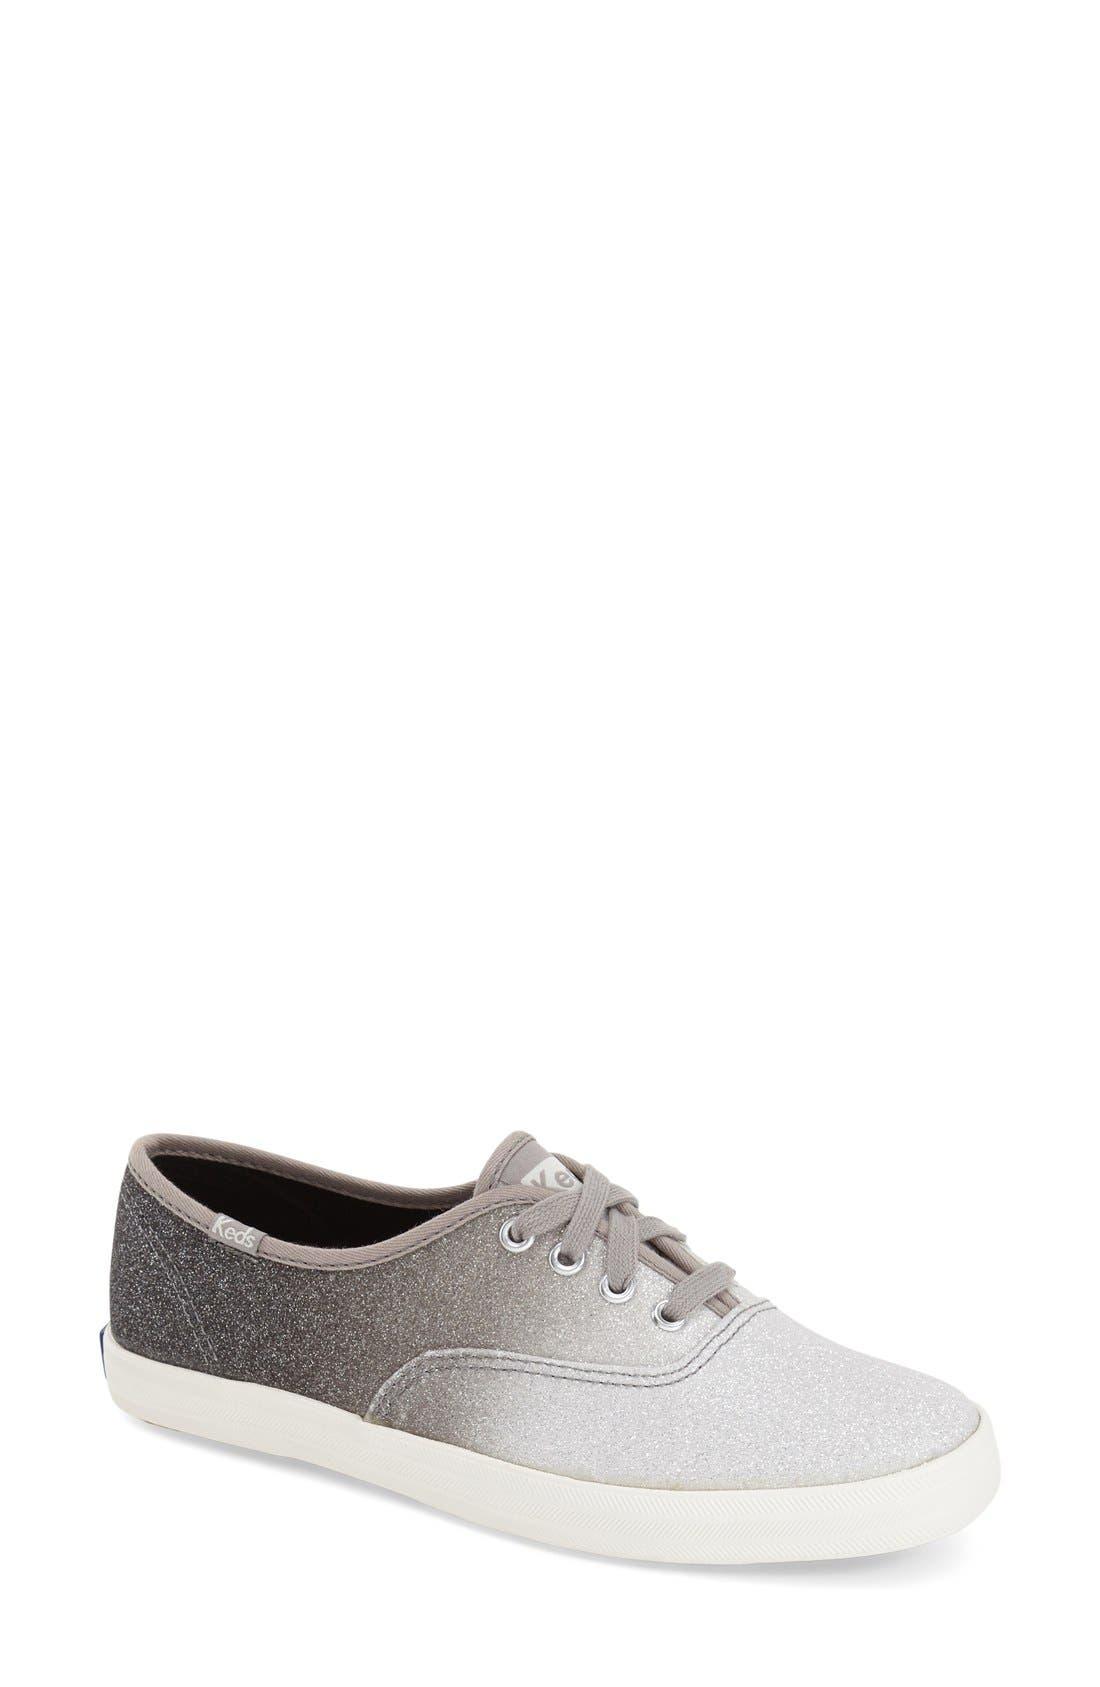 Main Image - Keds® 'Champion - Ombré Glitter' Sneaker (Women)